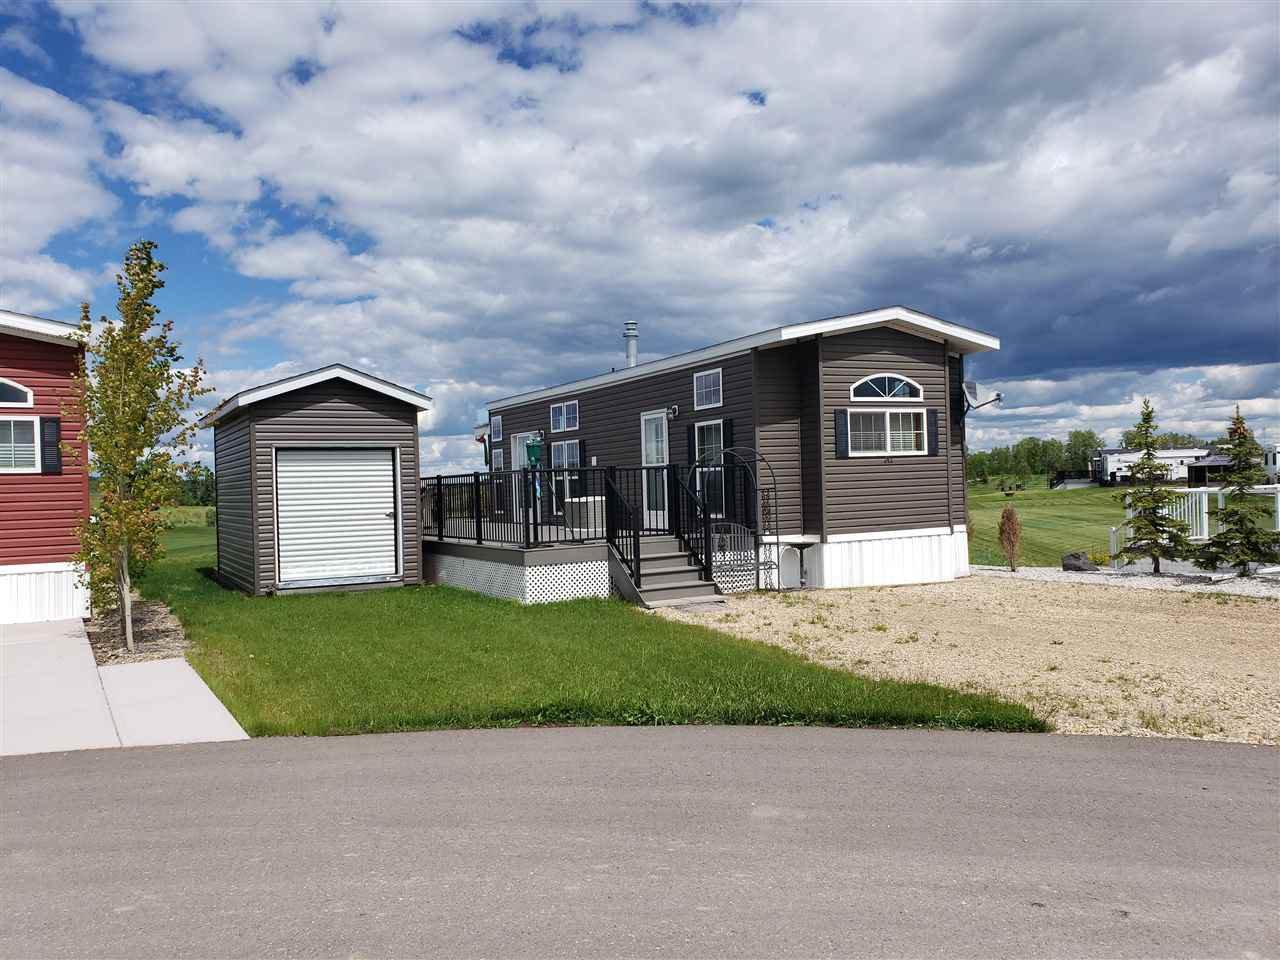 Main Photo: 242 53126 RANGE ROAD 70: Rural Parkland County House for sale : MLS®# E4132454